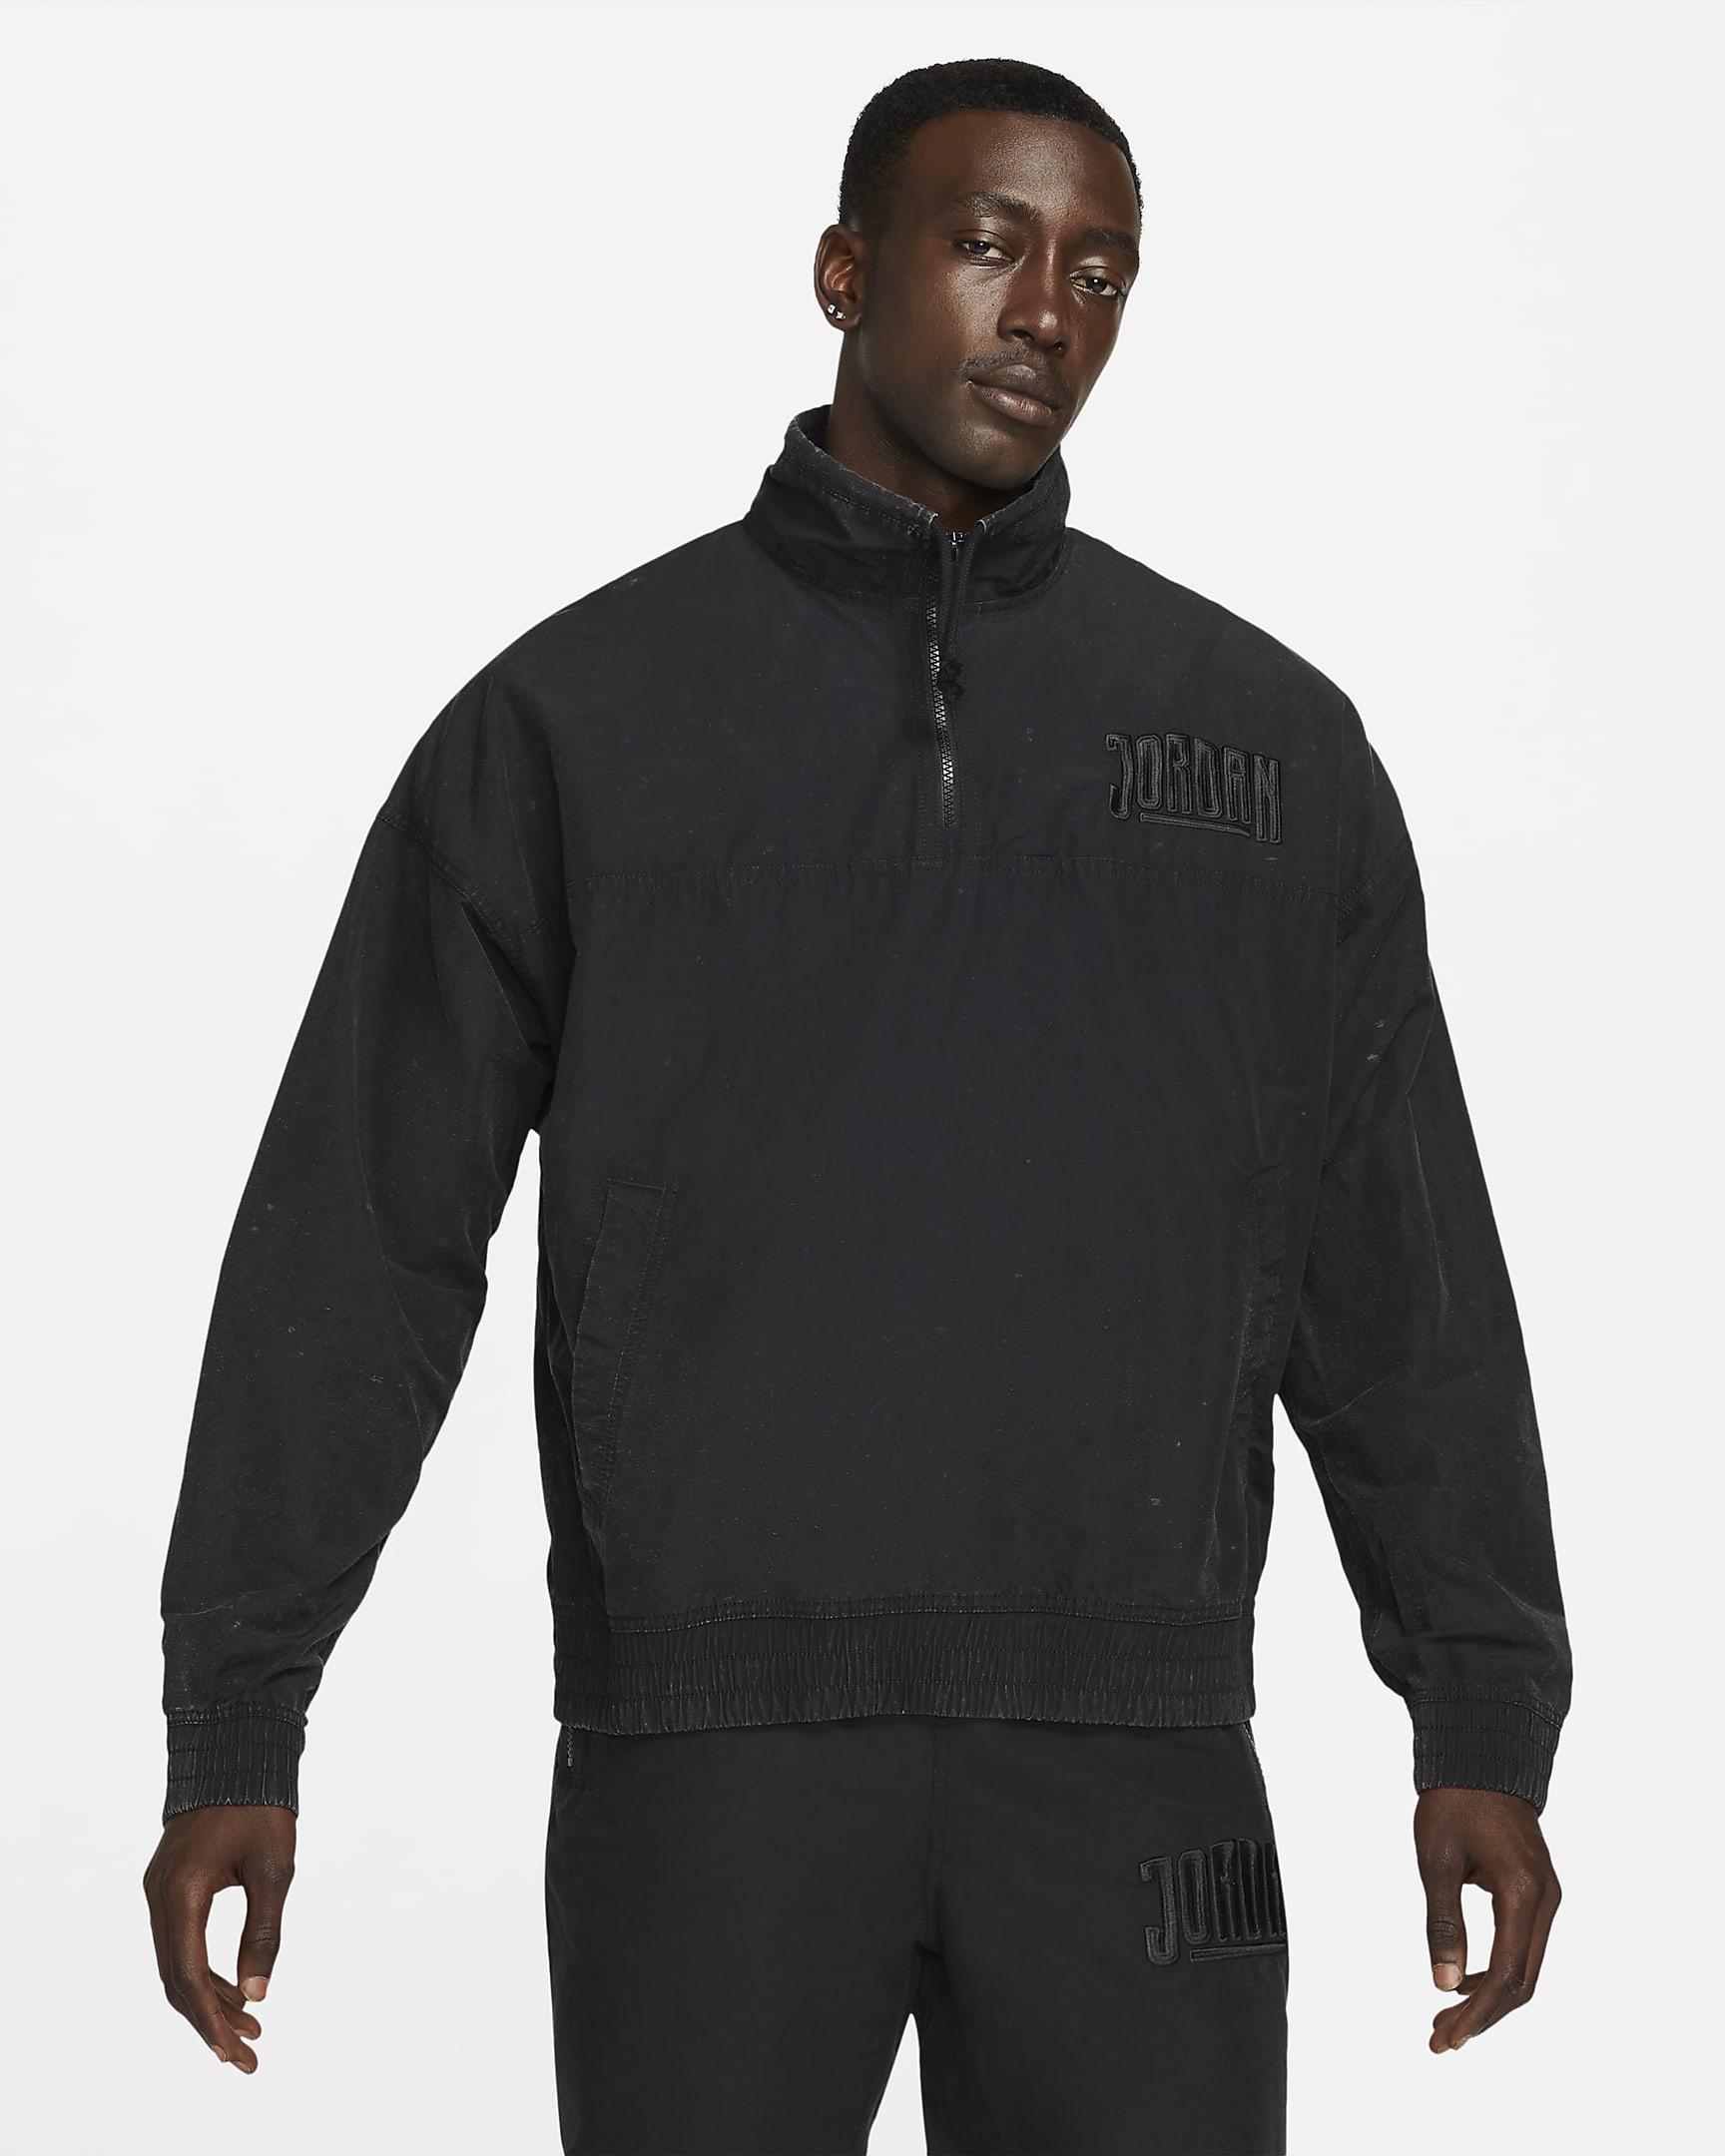 jordan-sport-dna-mens-jacket-8dhHDR.png